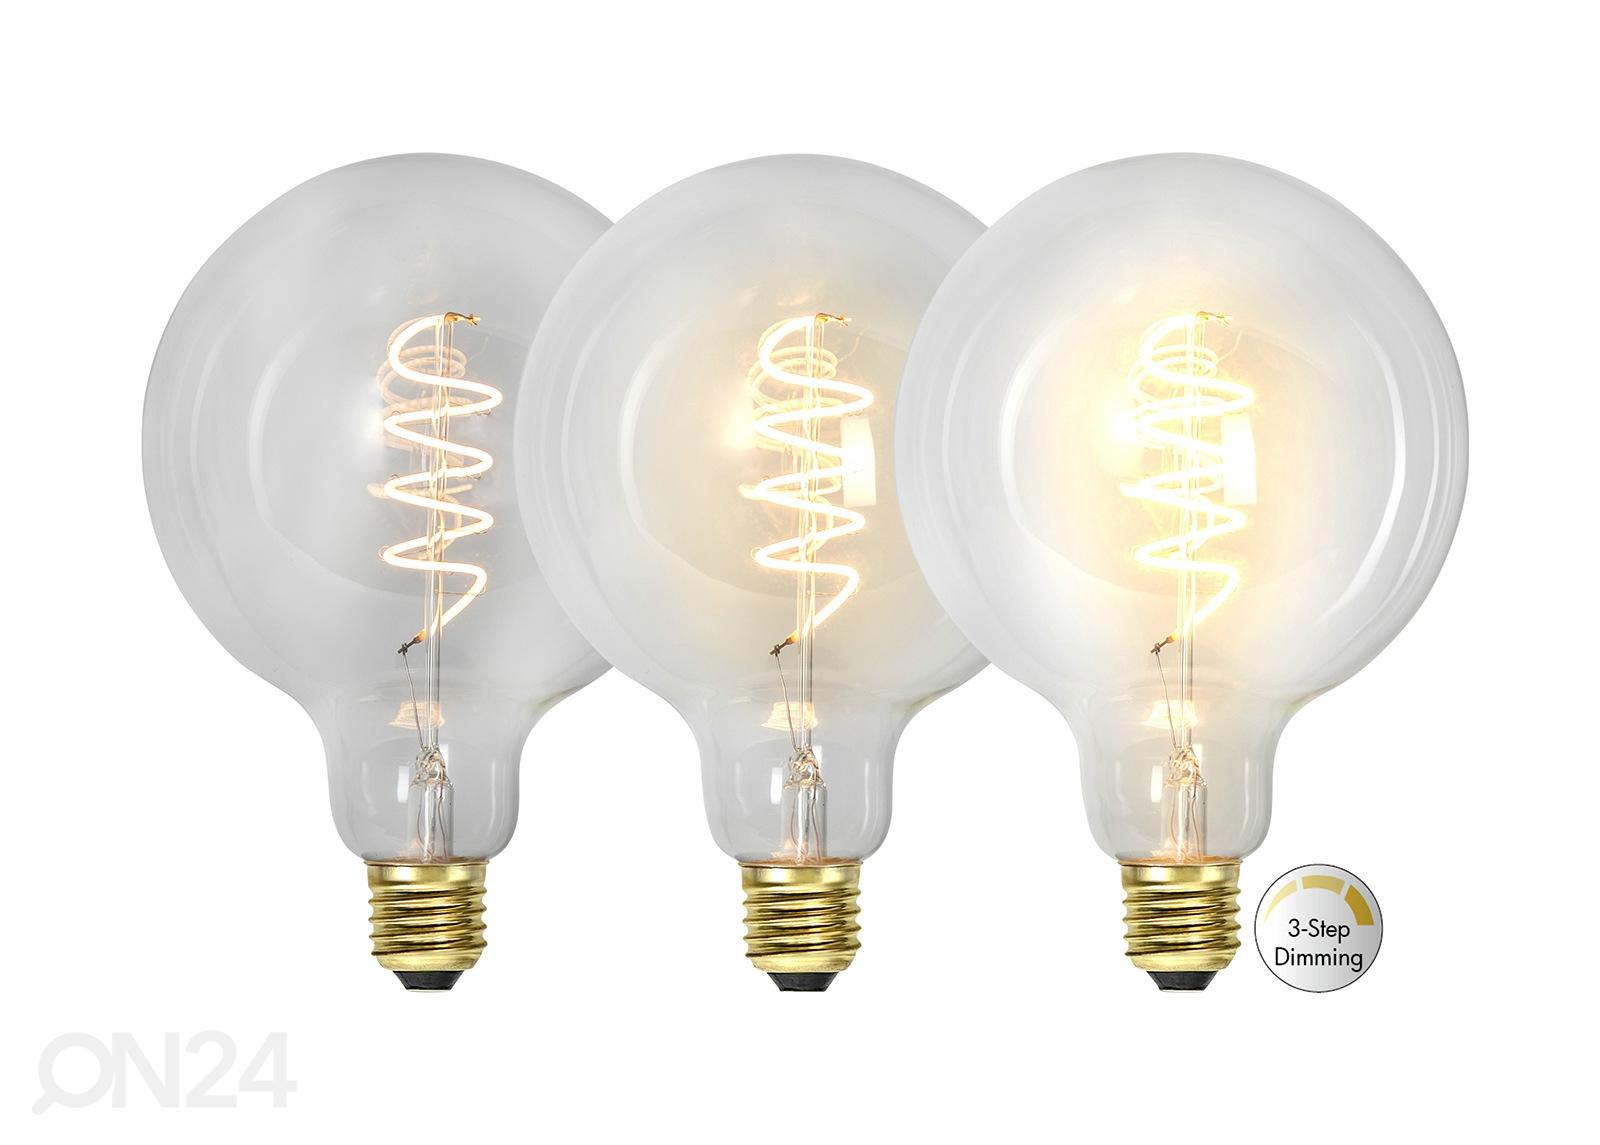 8f5db2a755e Dekoratiivne LED pirn E27 4 W AA-153693 - ON24 Sisustuskaubamaja